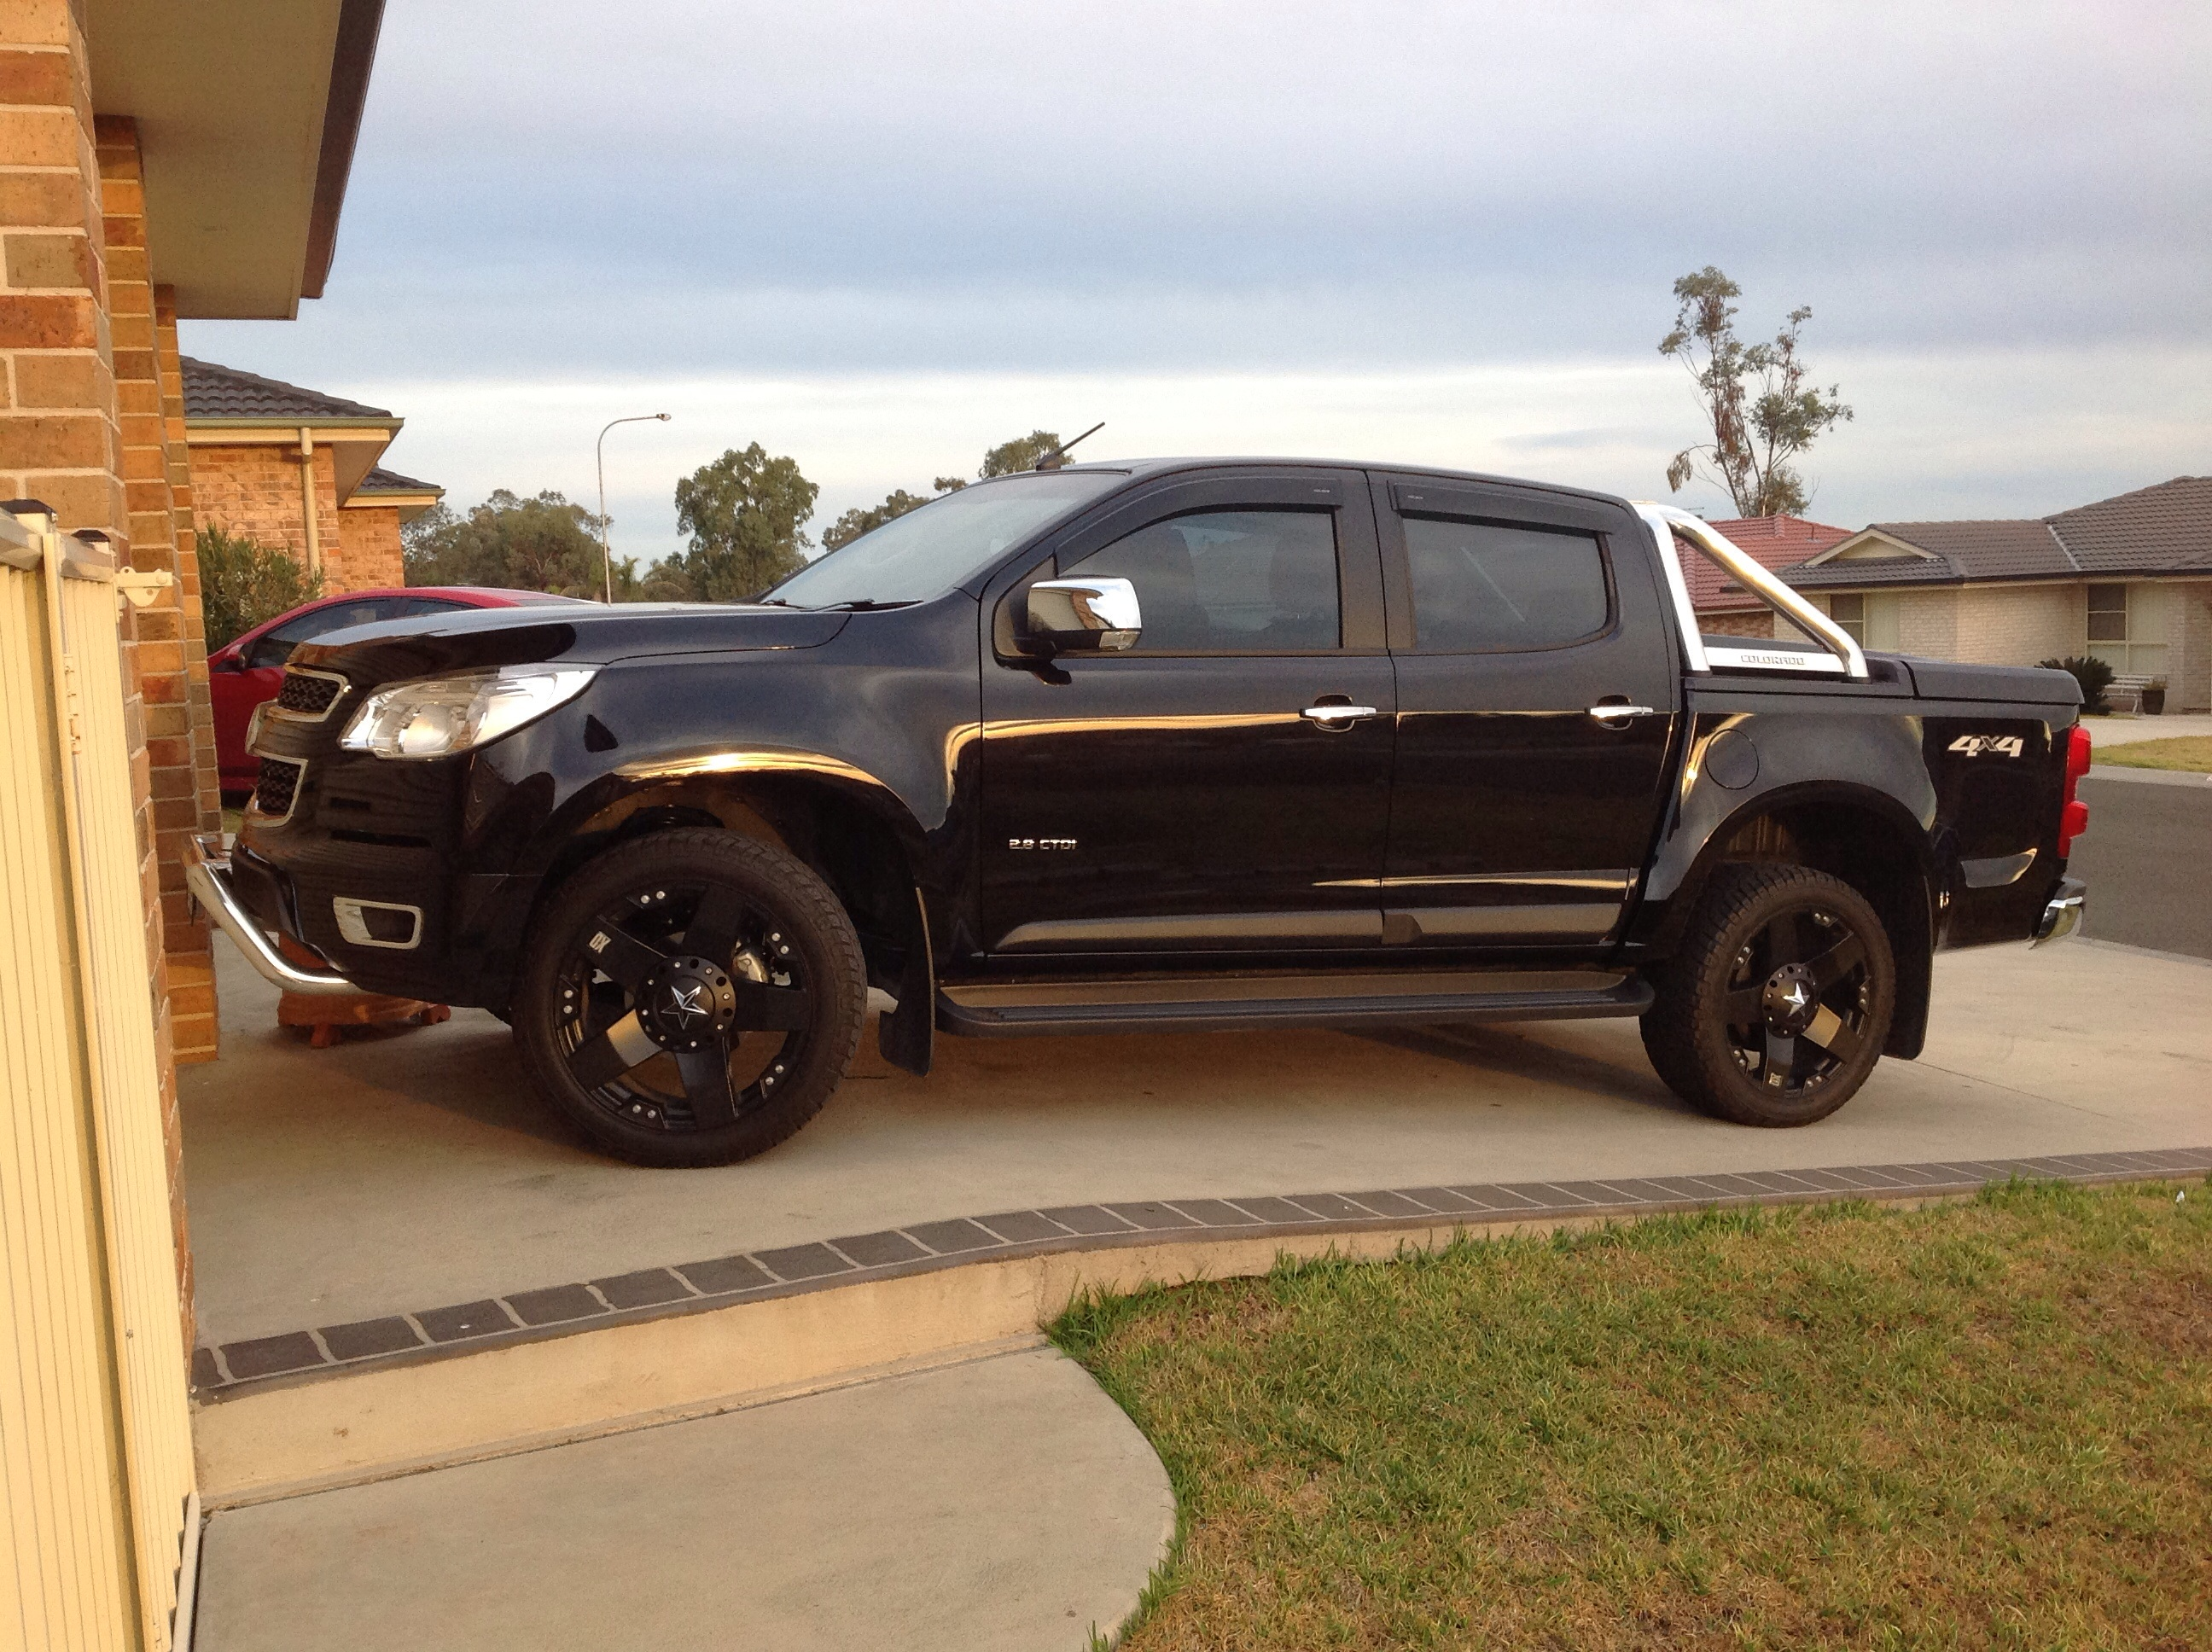 2012 holden colorado ltz 4x4 rg car sales nsw north west 2453061. Black Bedroom Furniture Sets. Home Design Ideas